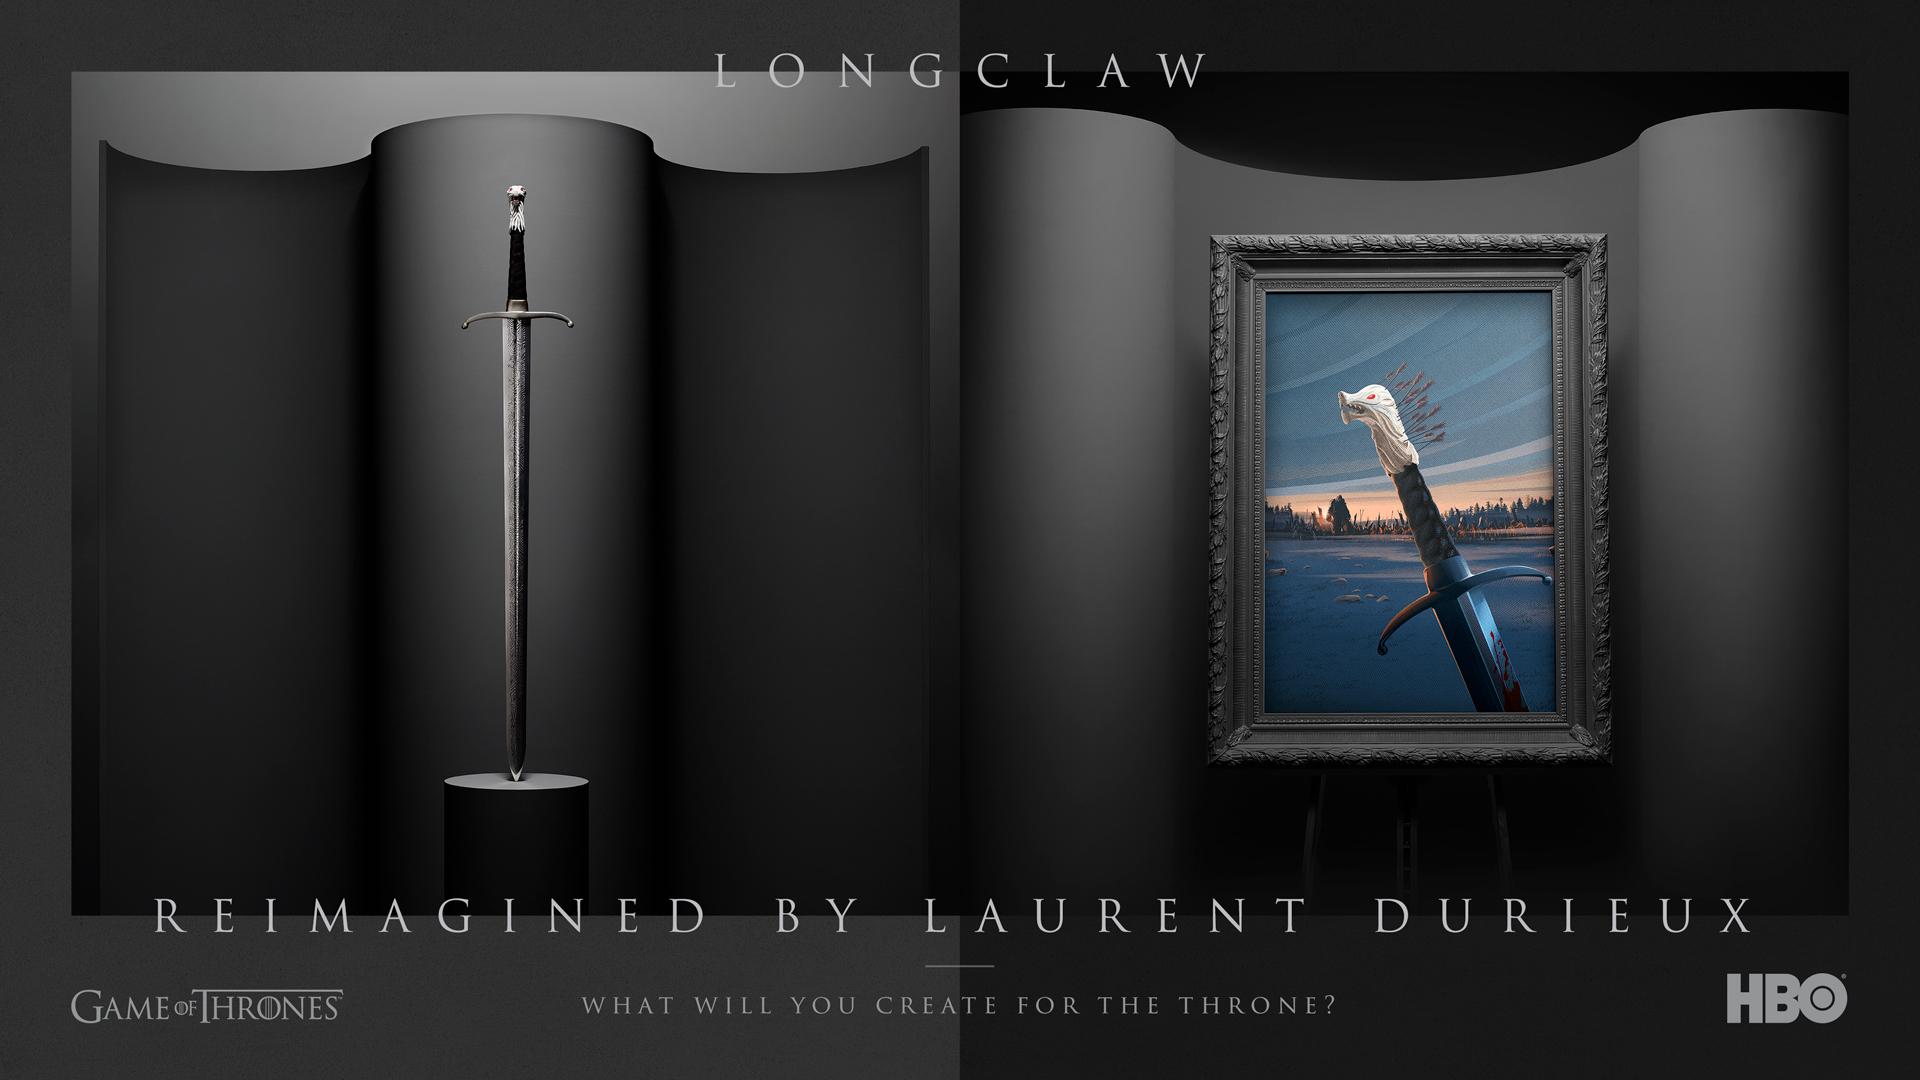 16_HONOR_Longclaw_Laurent_Durieux.jpg